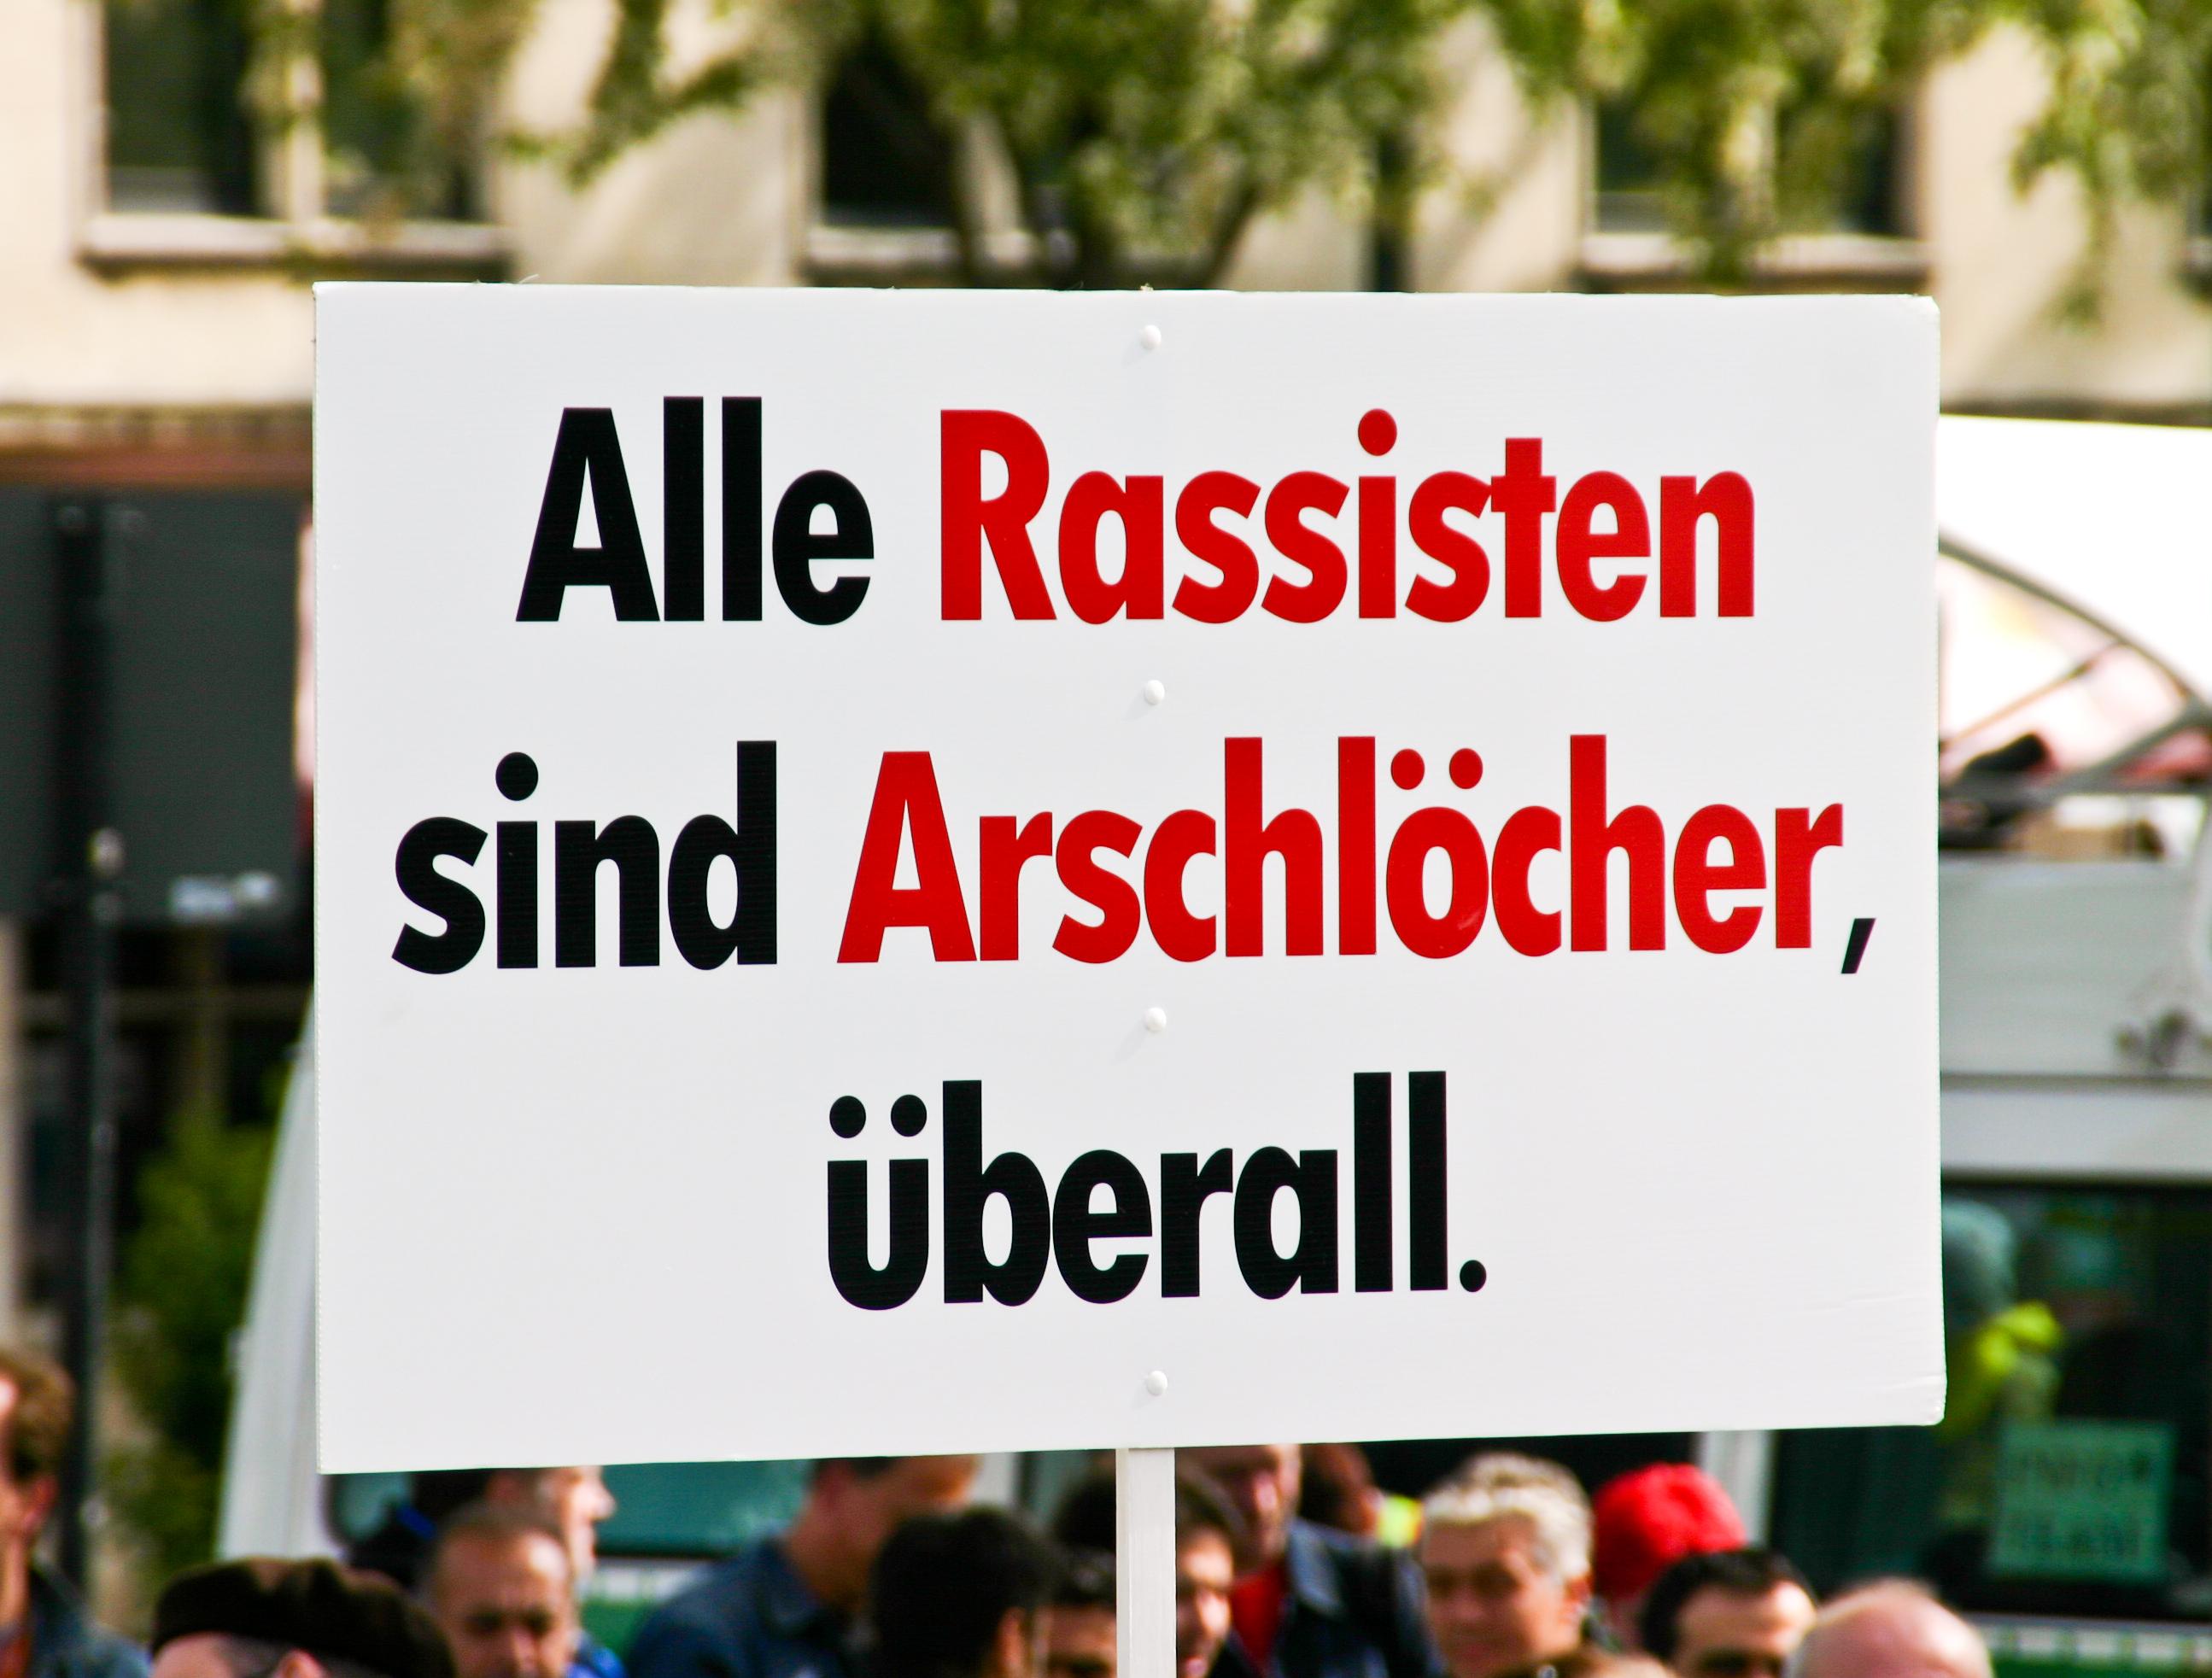 https://upload.wikimedia.org/wikipedia/commons/0/0e/Demo_K%C3%B6ln_stellt_sich_quer_Mai_2009_-_Schild_-Alle_Rassisten_sind_Arschl%C3%B6cher%2C_%C3%BCberall-8448.jpg